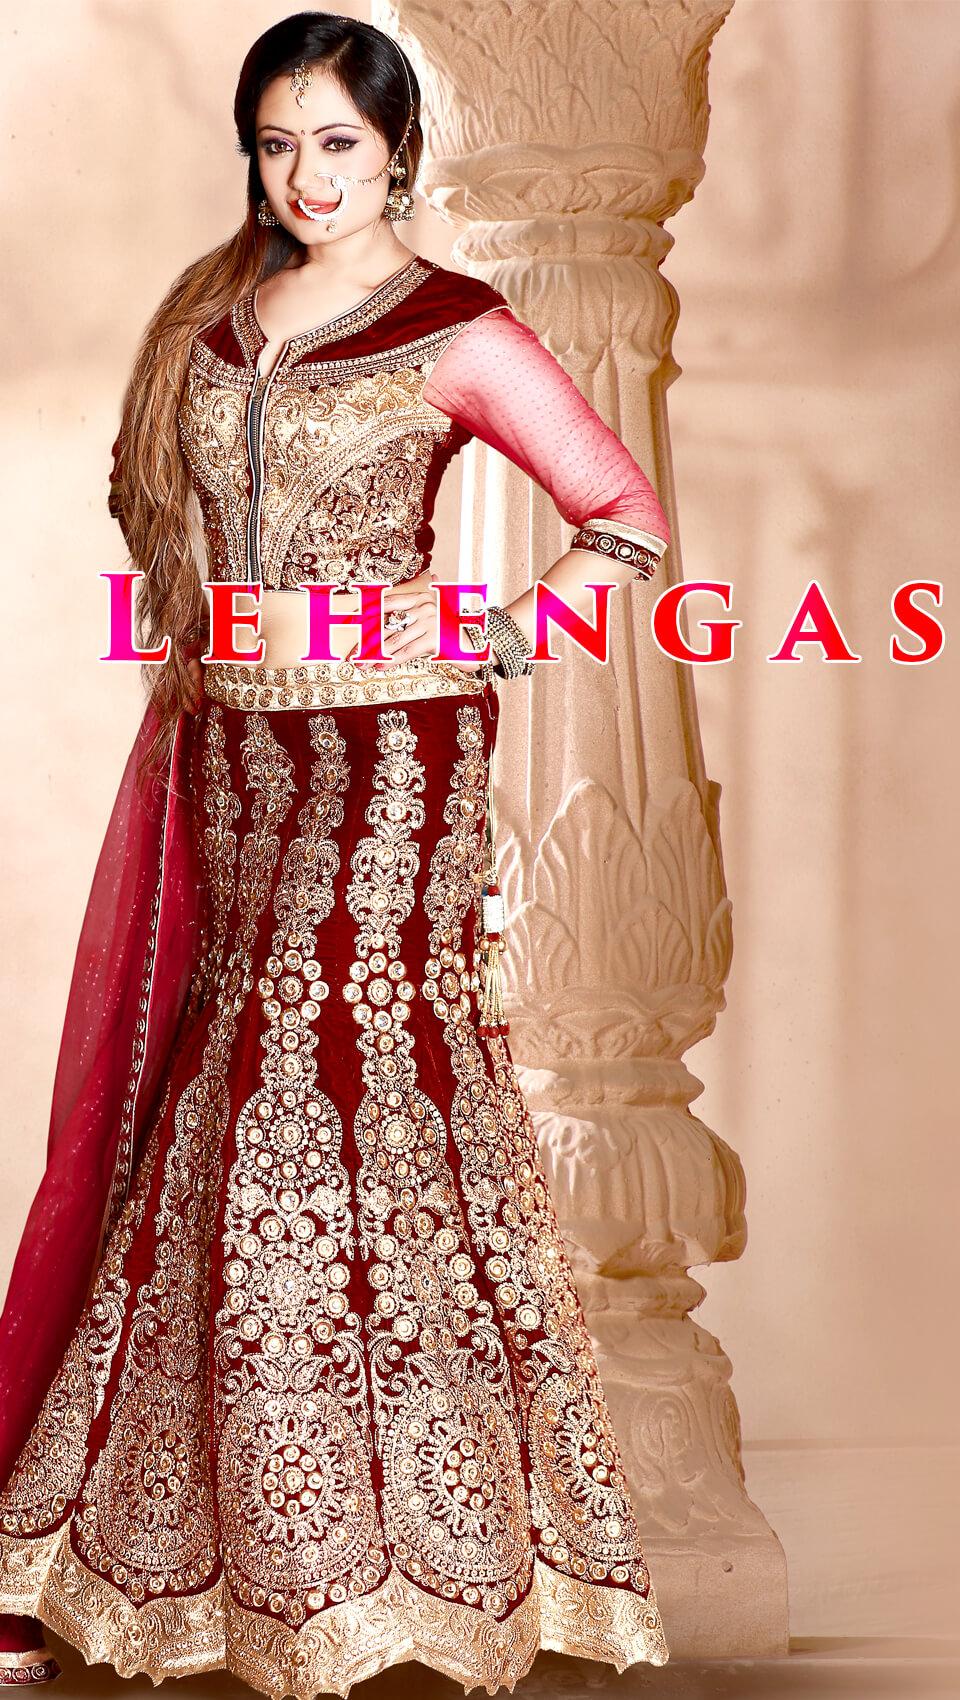 Designer Dress Boutique - POSH Chennai - demo - buzztm - Designer Dress Boutique | Designer Dresses materials  | Designer clothes shoes bags accessories | Women's luxury fashion | Ethnic Wear - Kurtis - Salwar Suits | Printed Cotton Dresses | Bandhej Silk Dresses | Designer Dresses materials - POSH